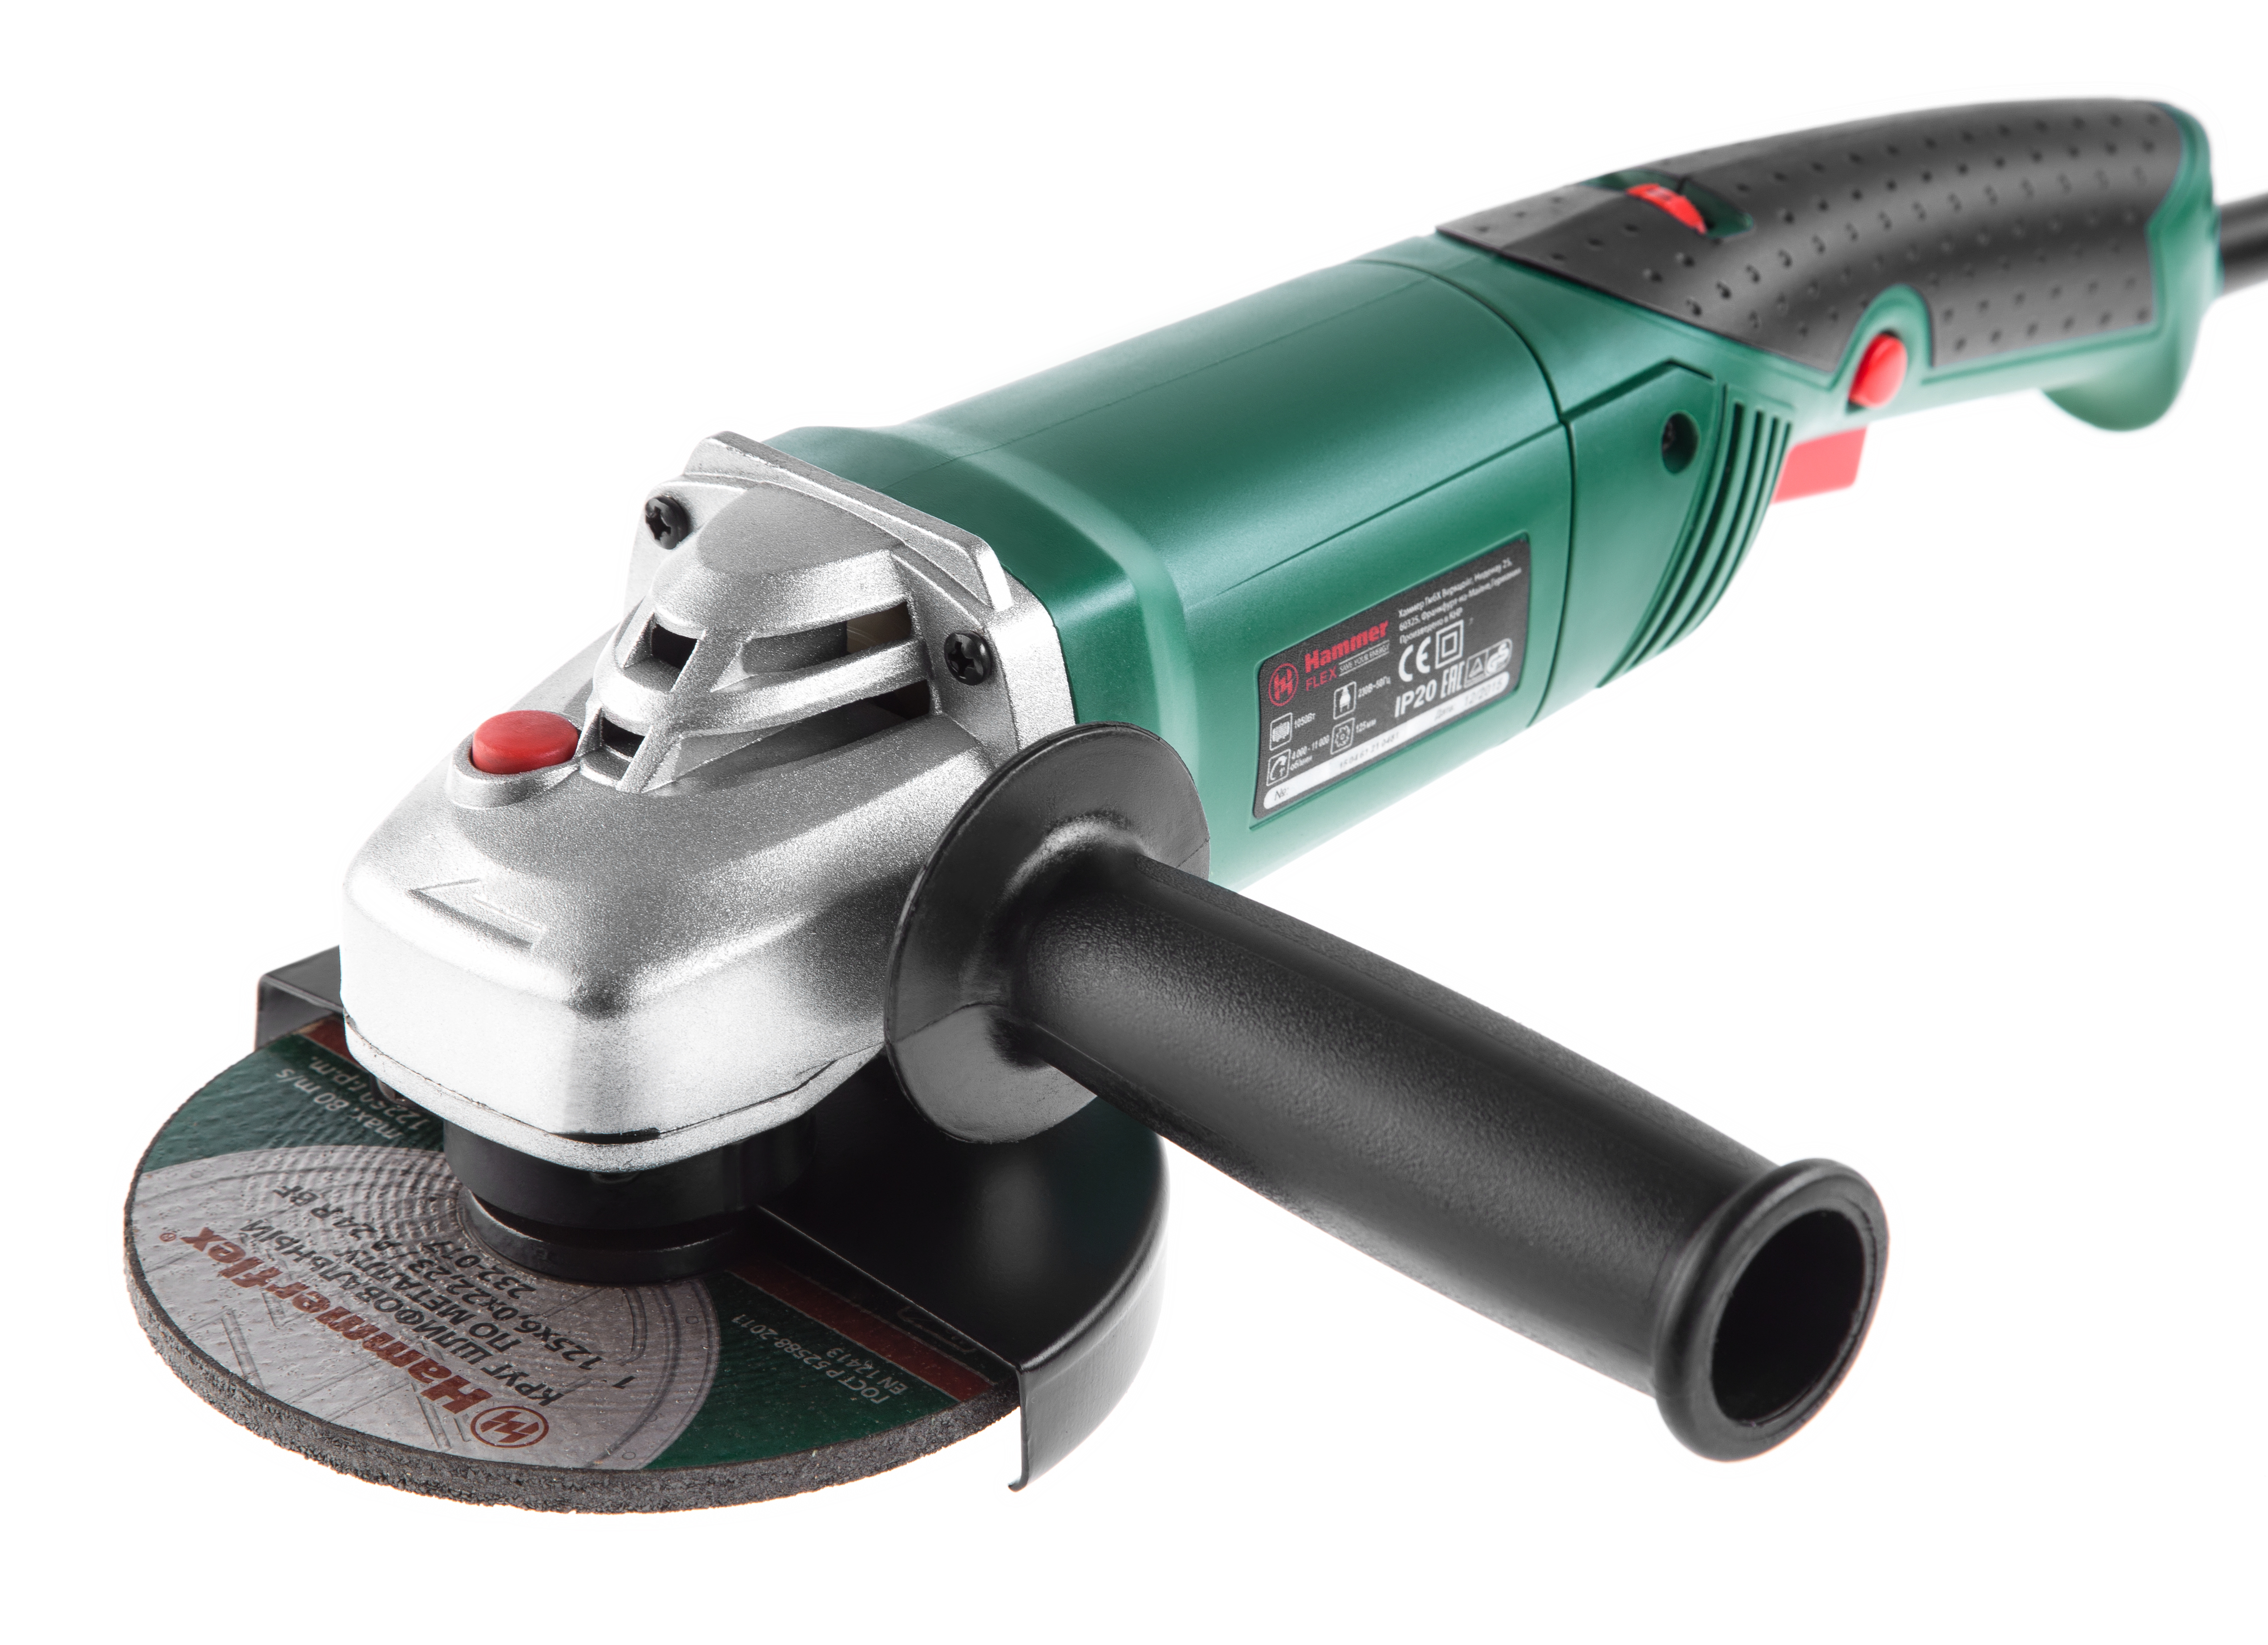 УШМ (болгарка) Hammer Usm1050a  угловая шлифмашина hammer usm1050a